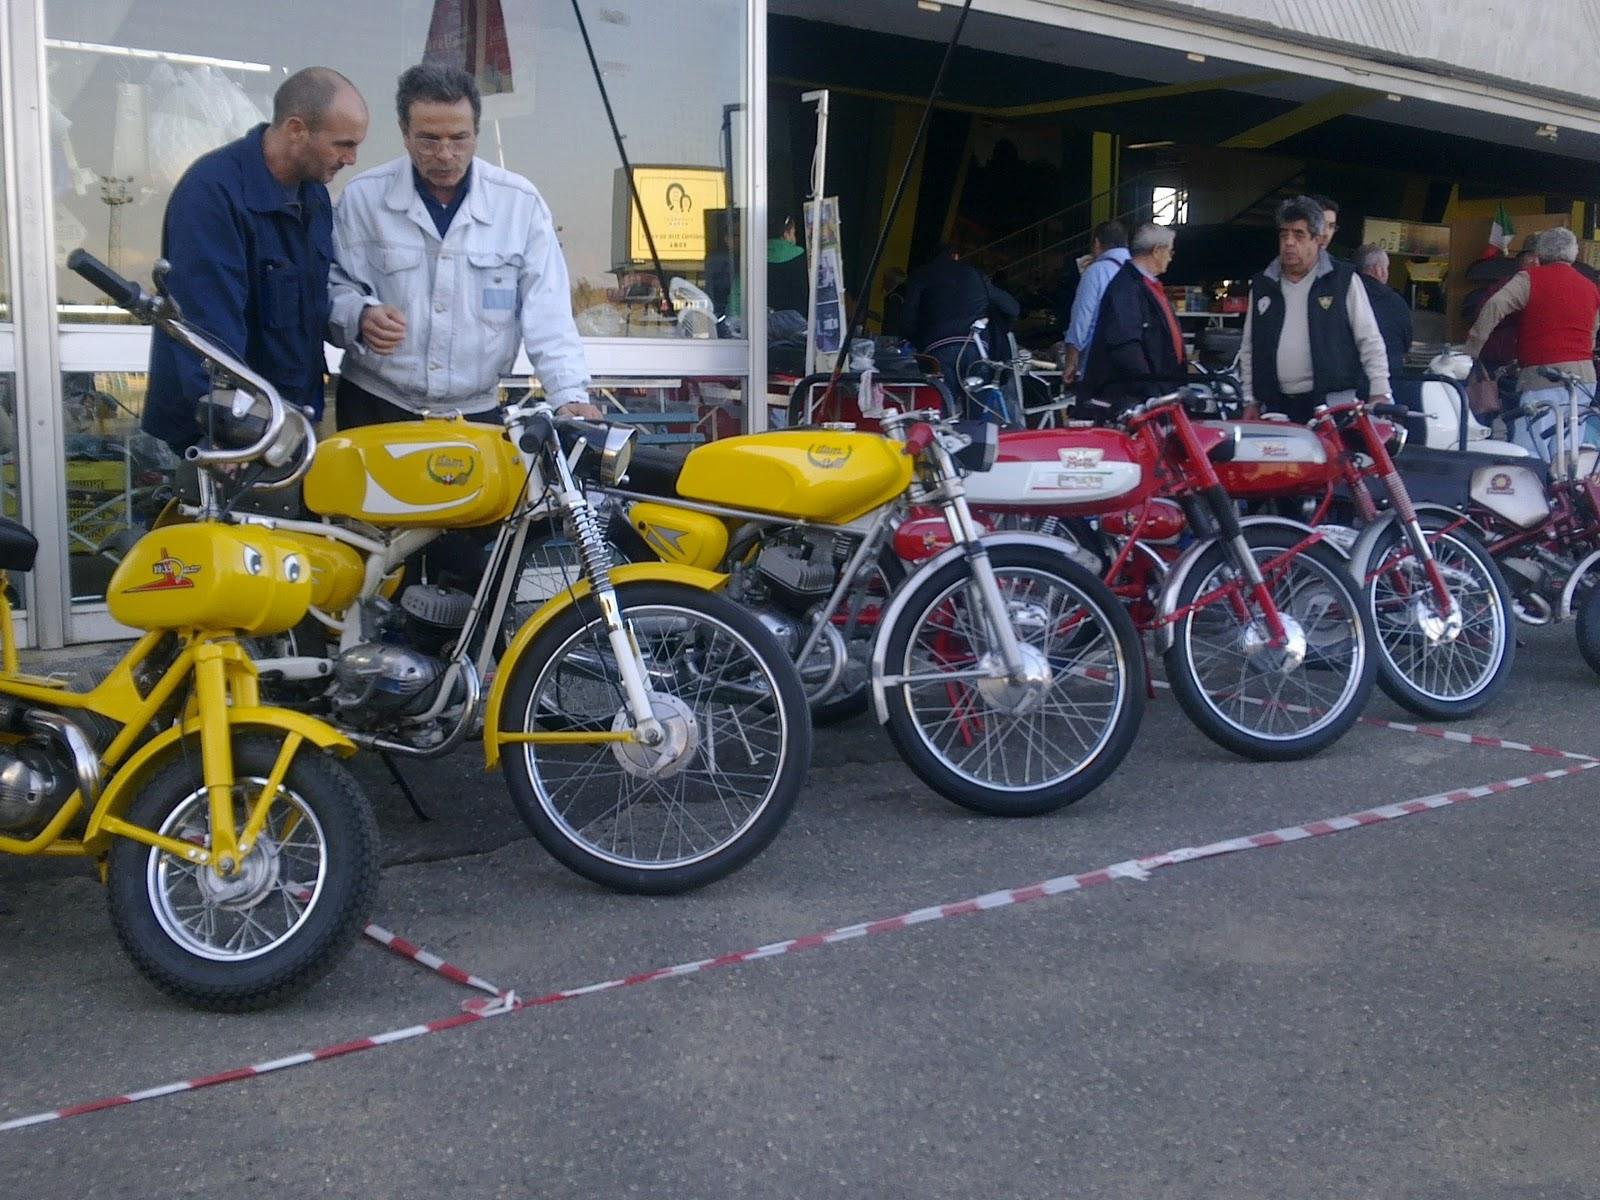 Nostalgia Club Auto E Moto Depoca | Autos Post - photo#35